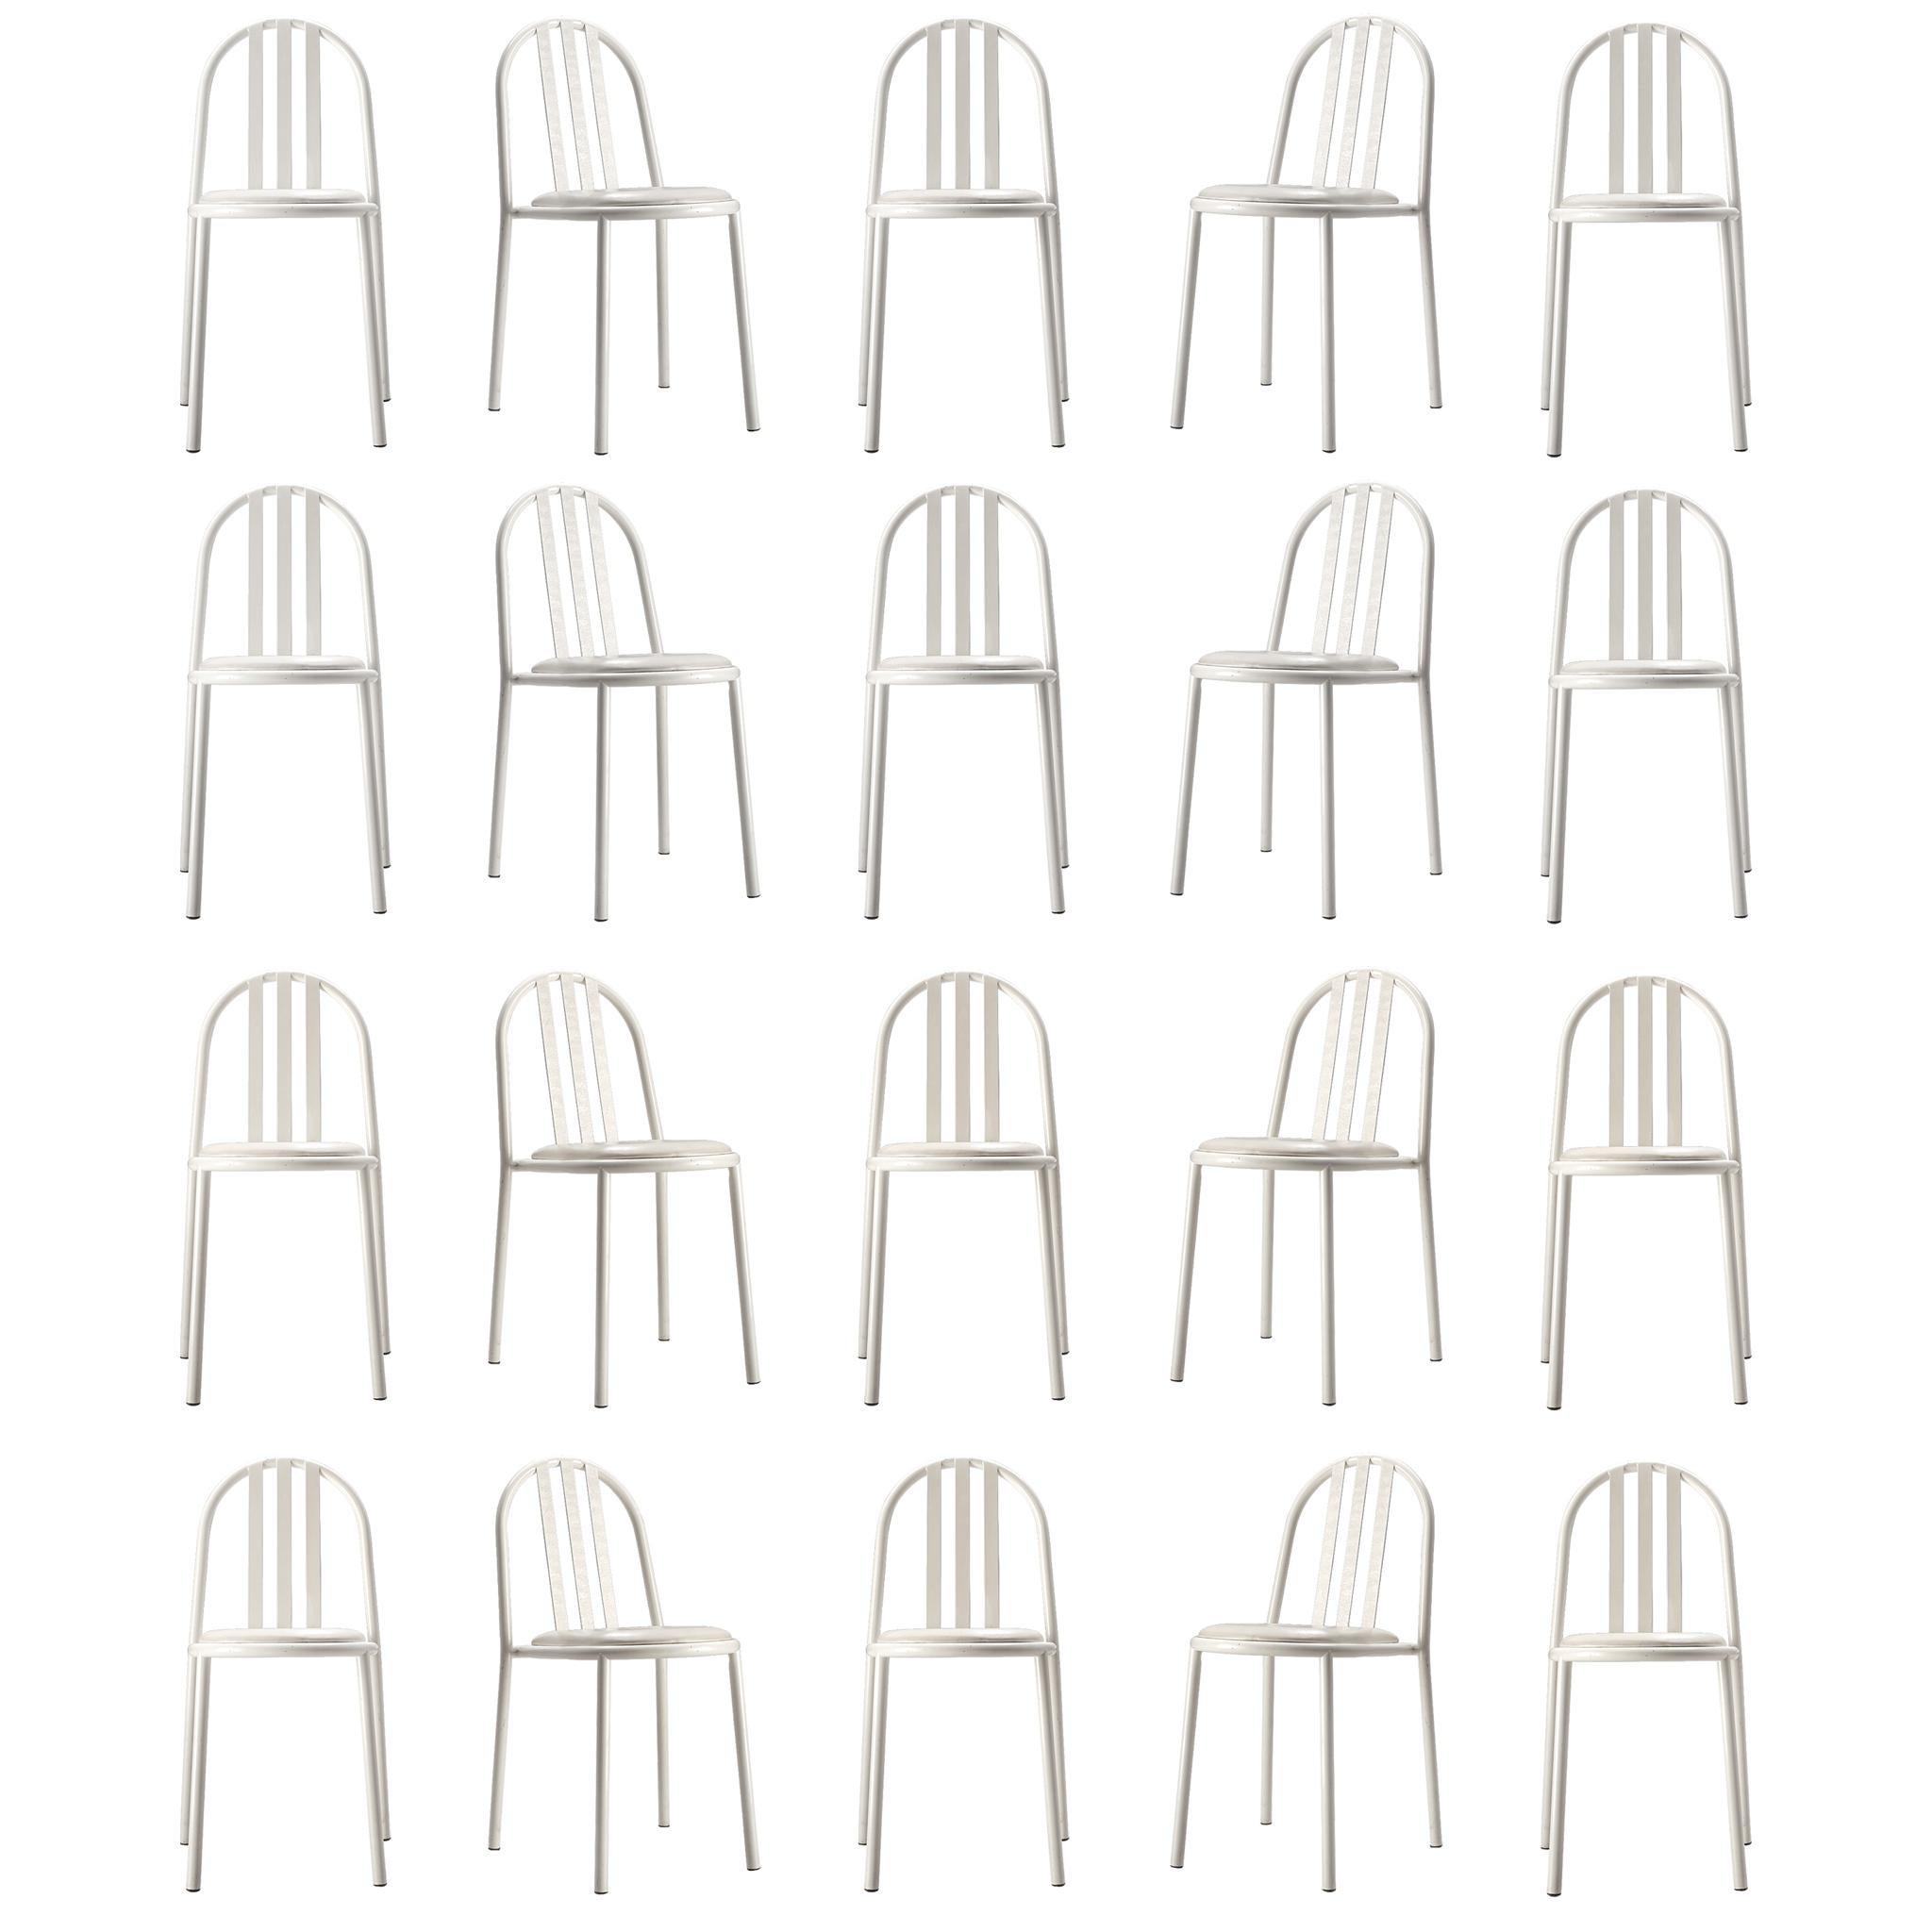 Large Set of White Tubular Steel Chairs by Robert Mallet Stevens